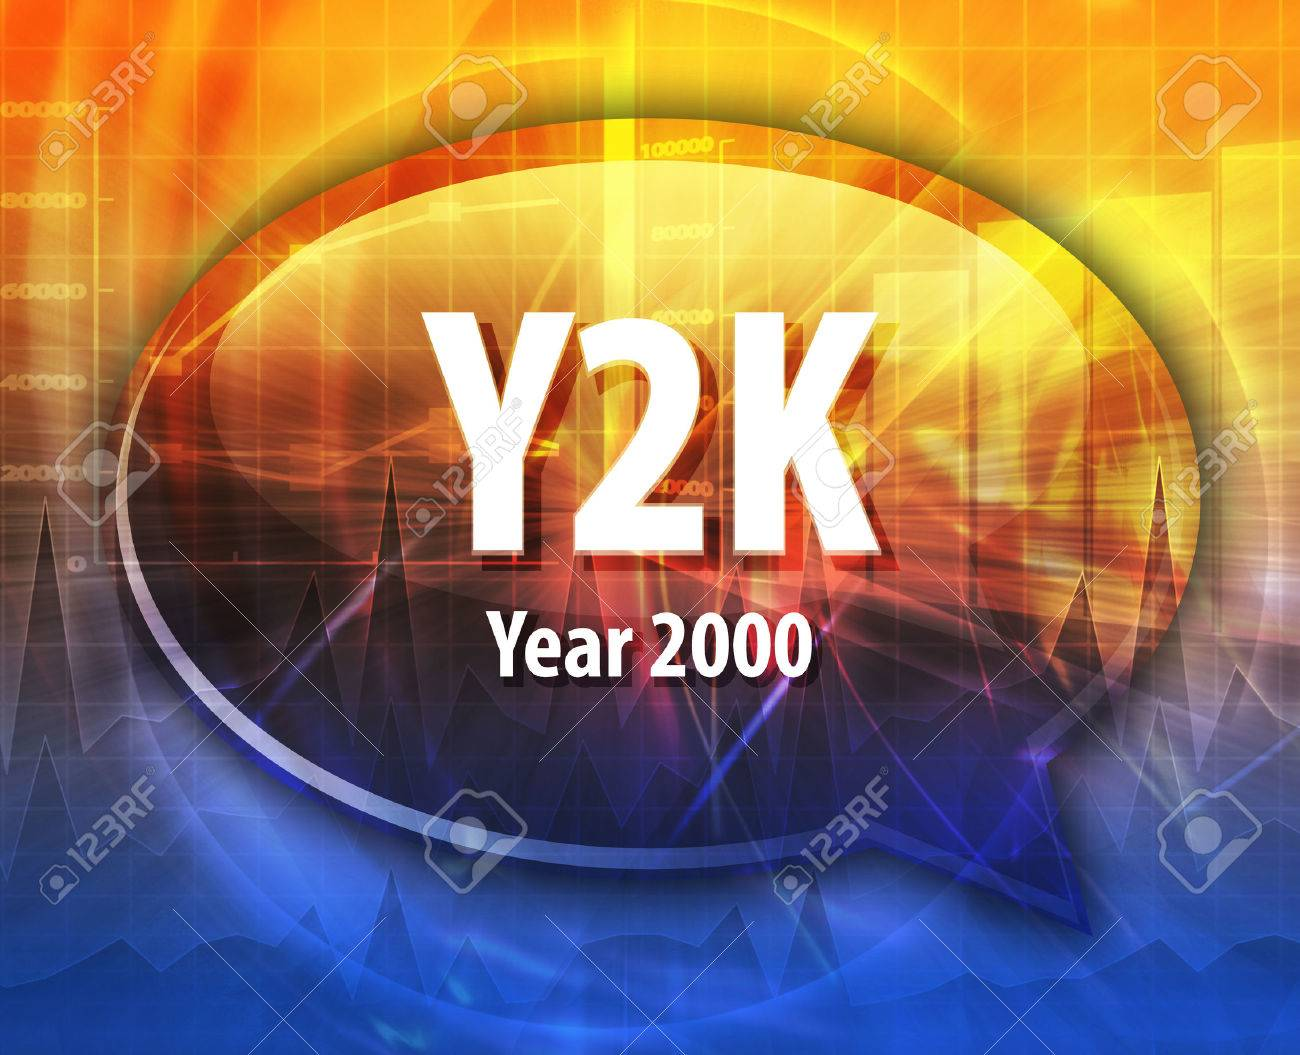 Speech bubble illustration of information technology acronym abbreviation term definition Y2K Year 2000 - 43979978